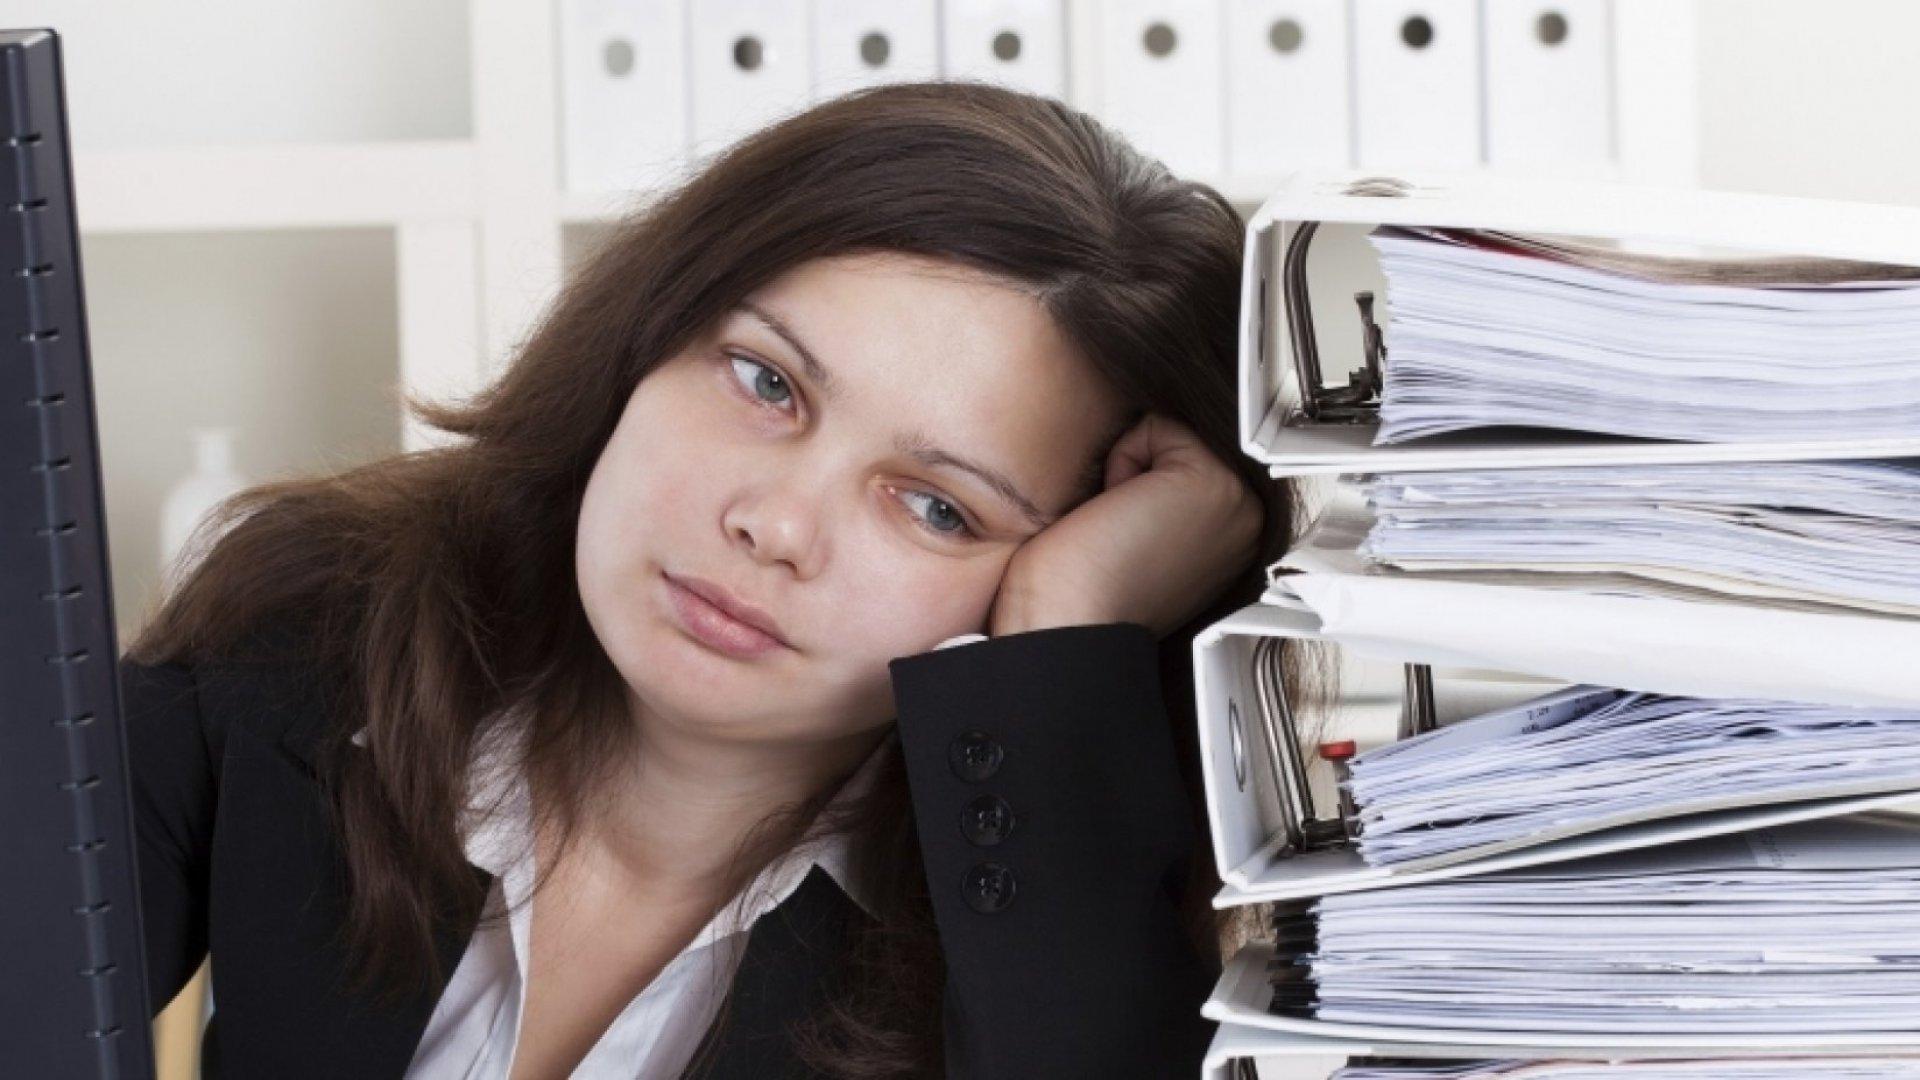 3 Practical Ways to Avoid Job Burnout